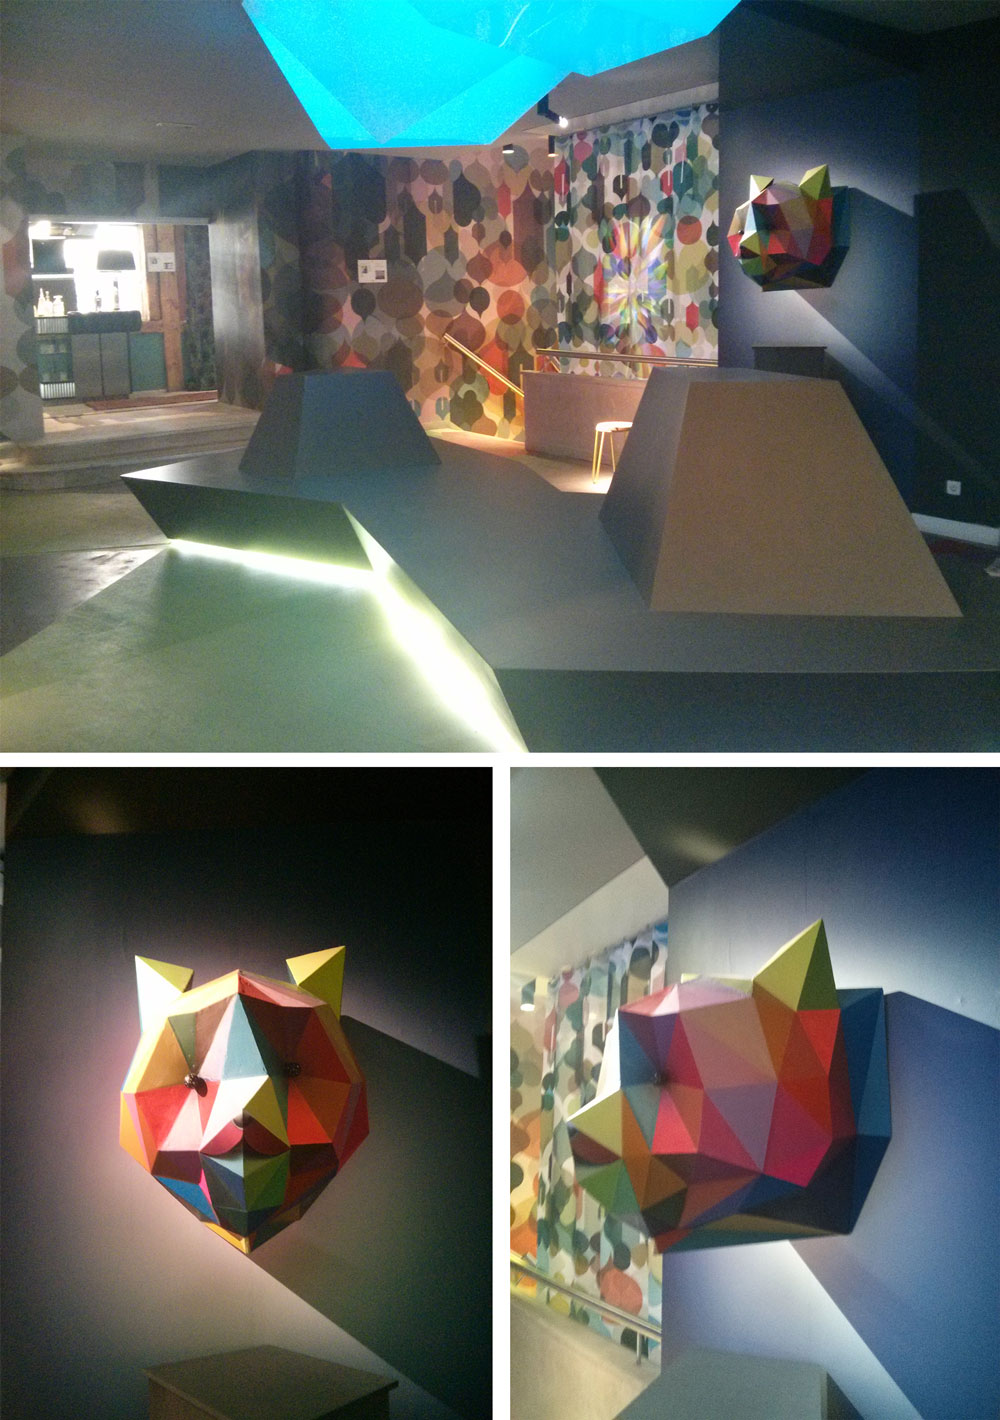 Espacio Clorofilia Digital - Full colors Life